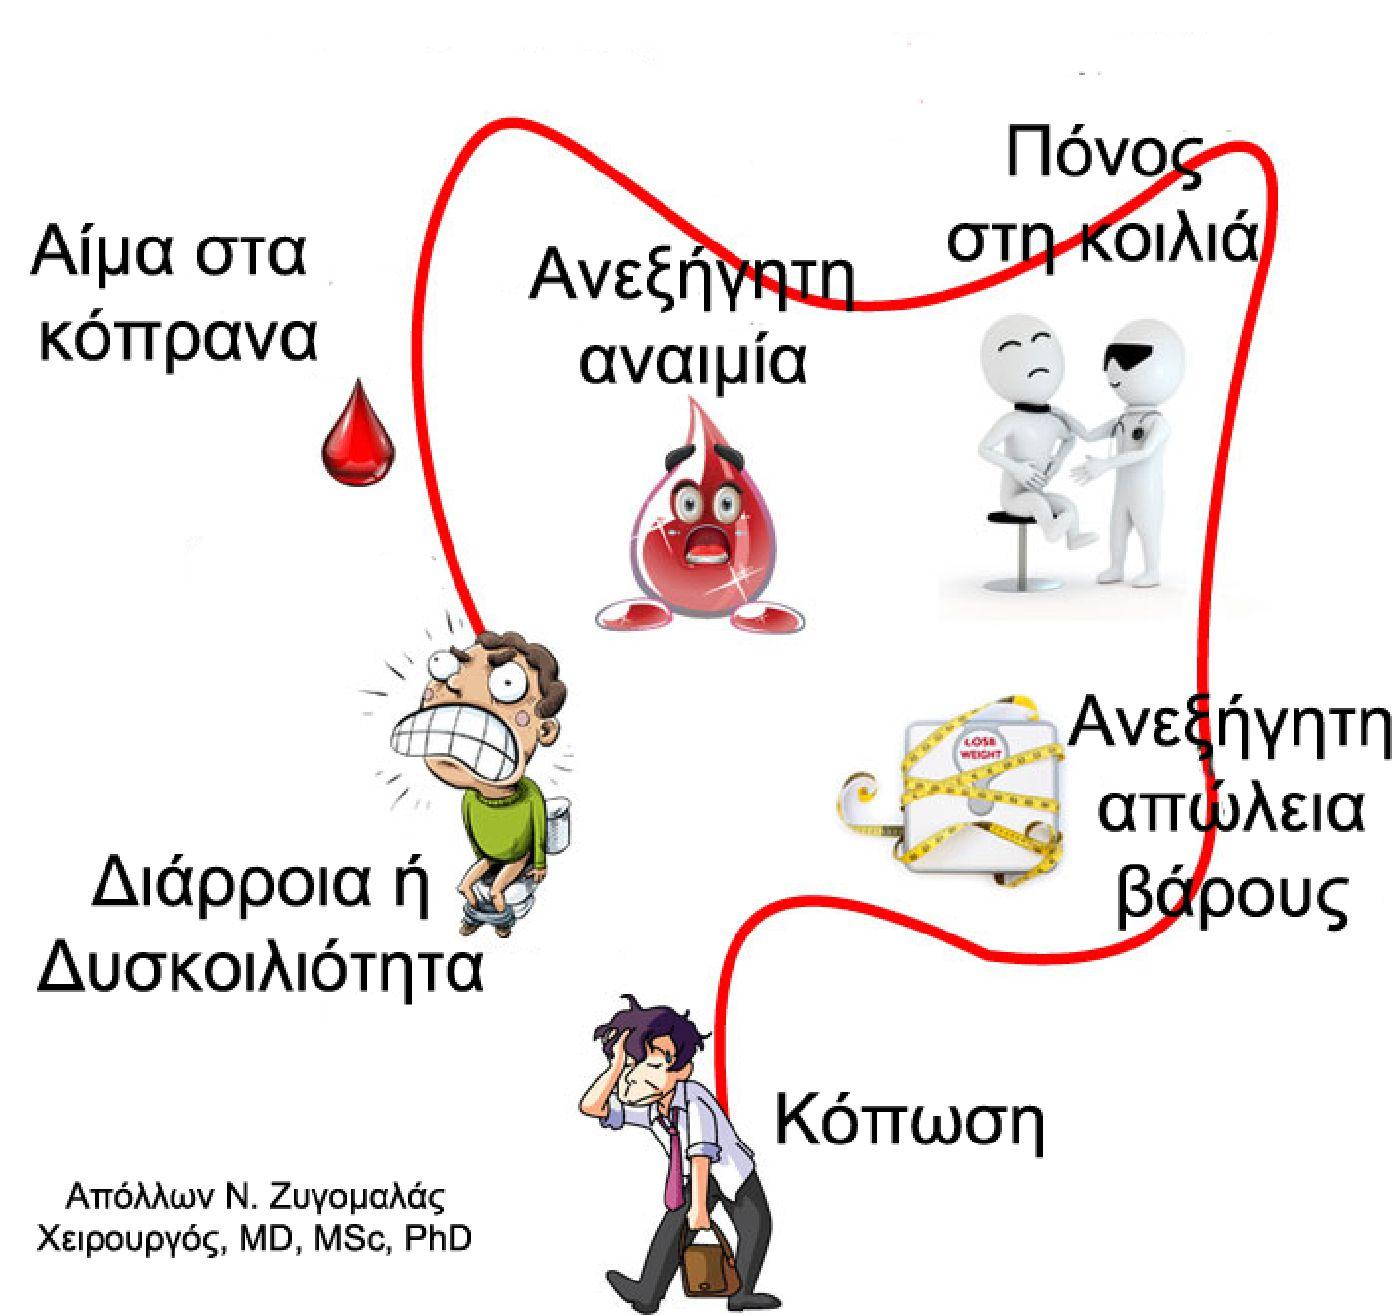 db0e912adce3 Το πιο συχνό σύμπτωμα είναι η αιμορραγία από τον πρωκτό και το αίμα στα  κόπρανα. Άλλα συμπτώματα είναι η μέλαινα (μαύρα σαν πίσσα κόπρανα)